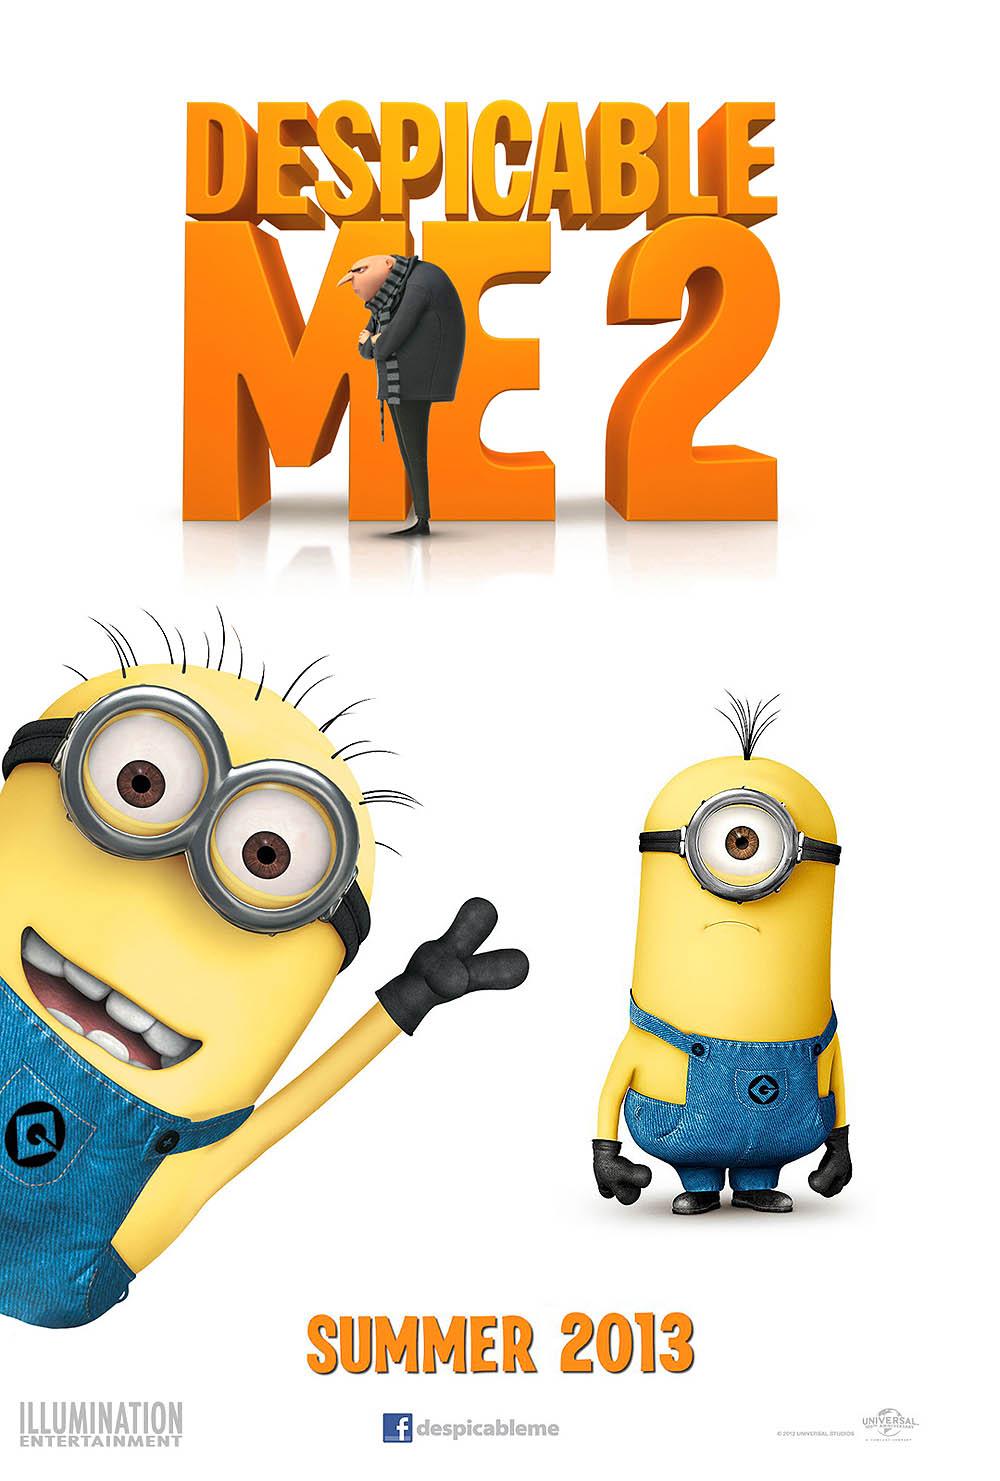 Despicable Me 2 Pre-Release Poster